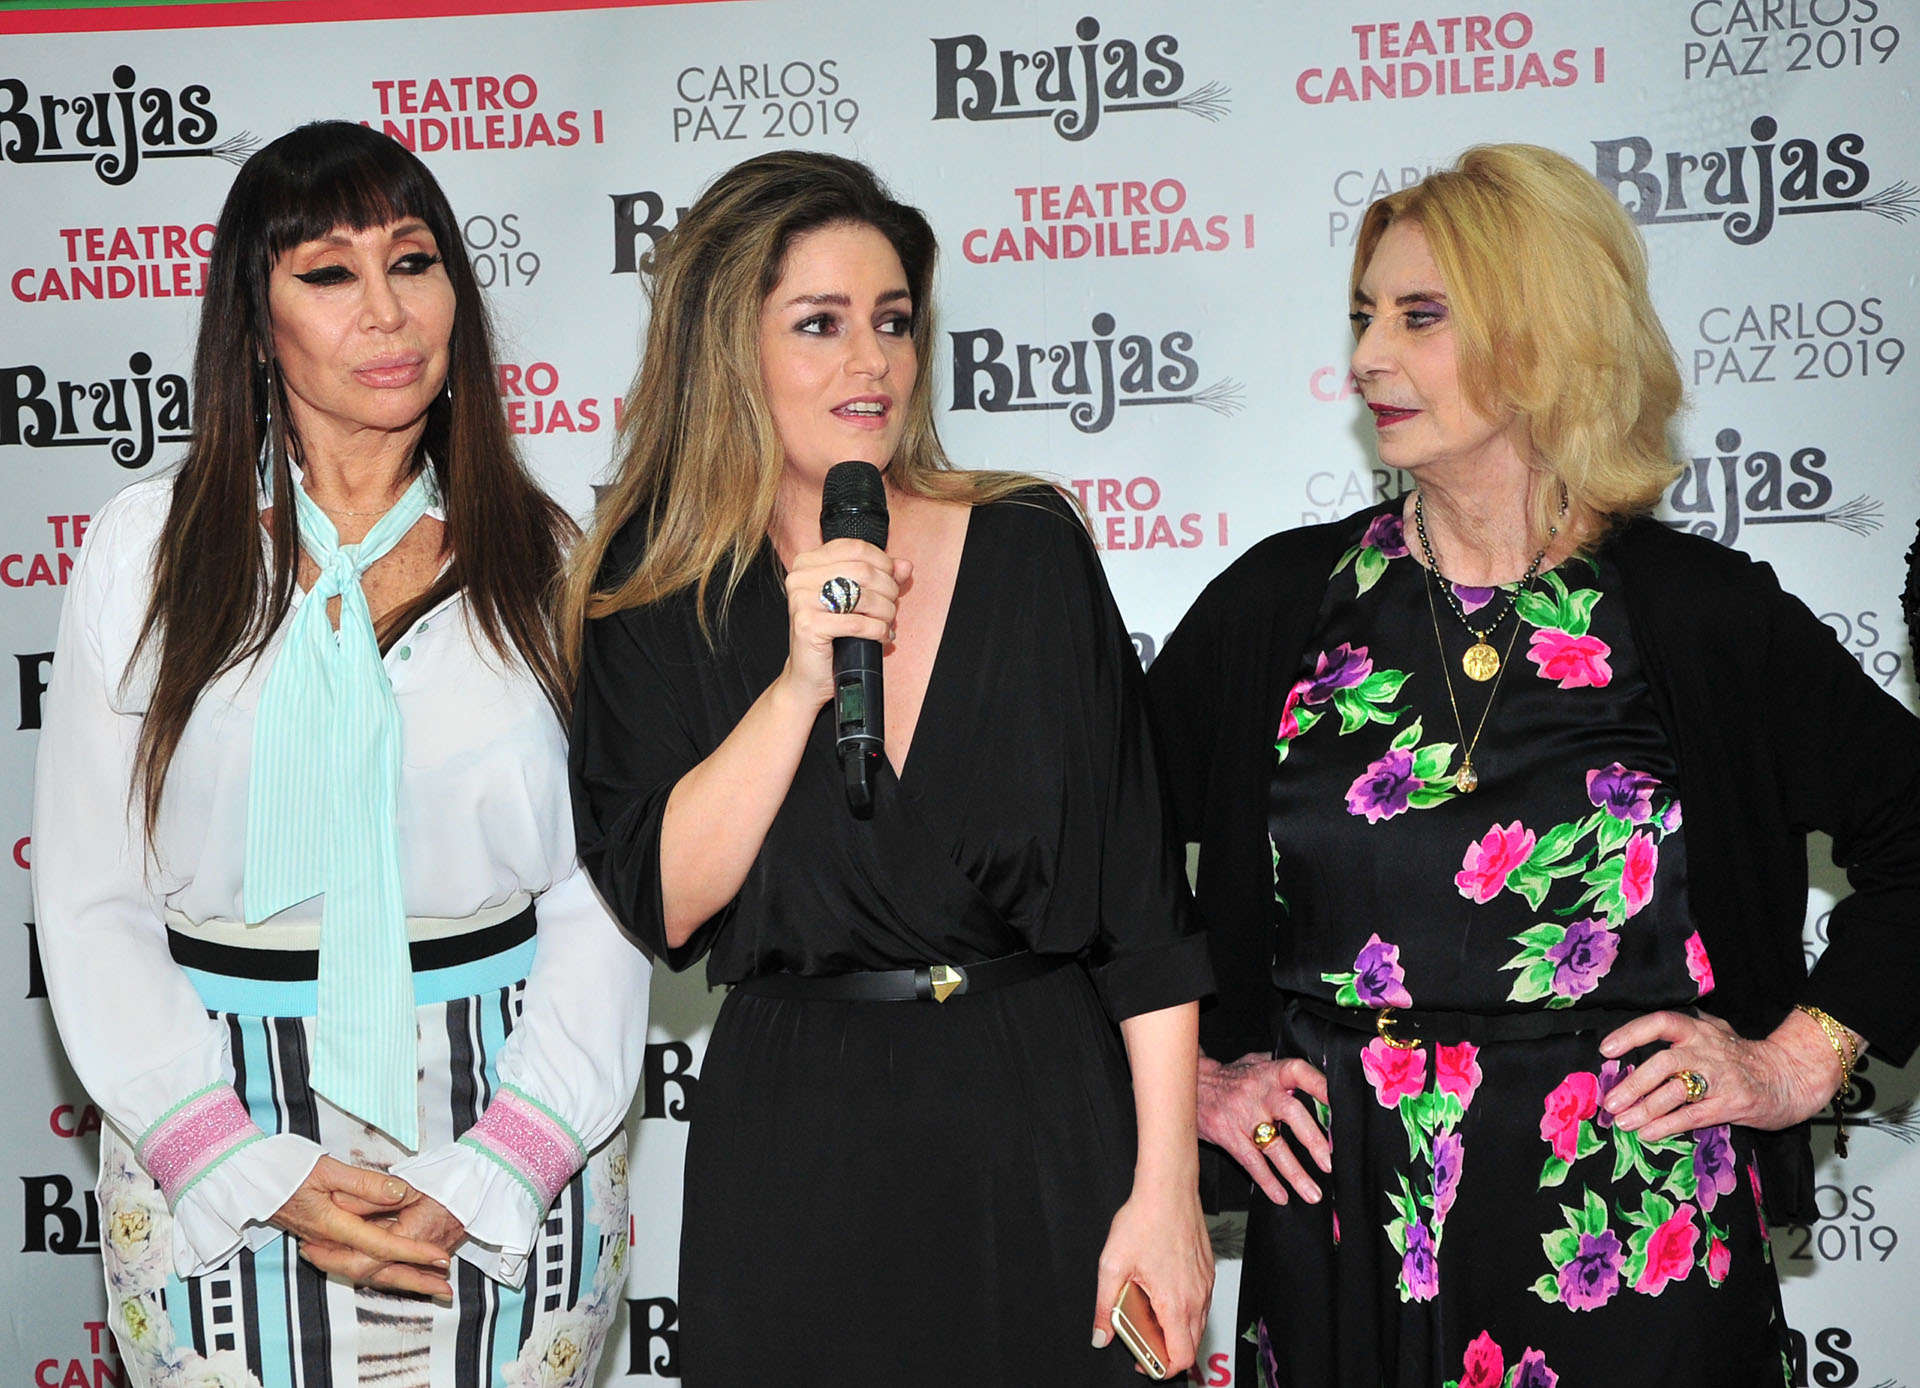 Moria Casán, Romina Ricci y Graciela Dufau